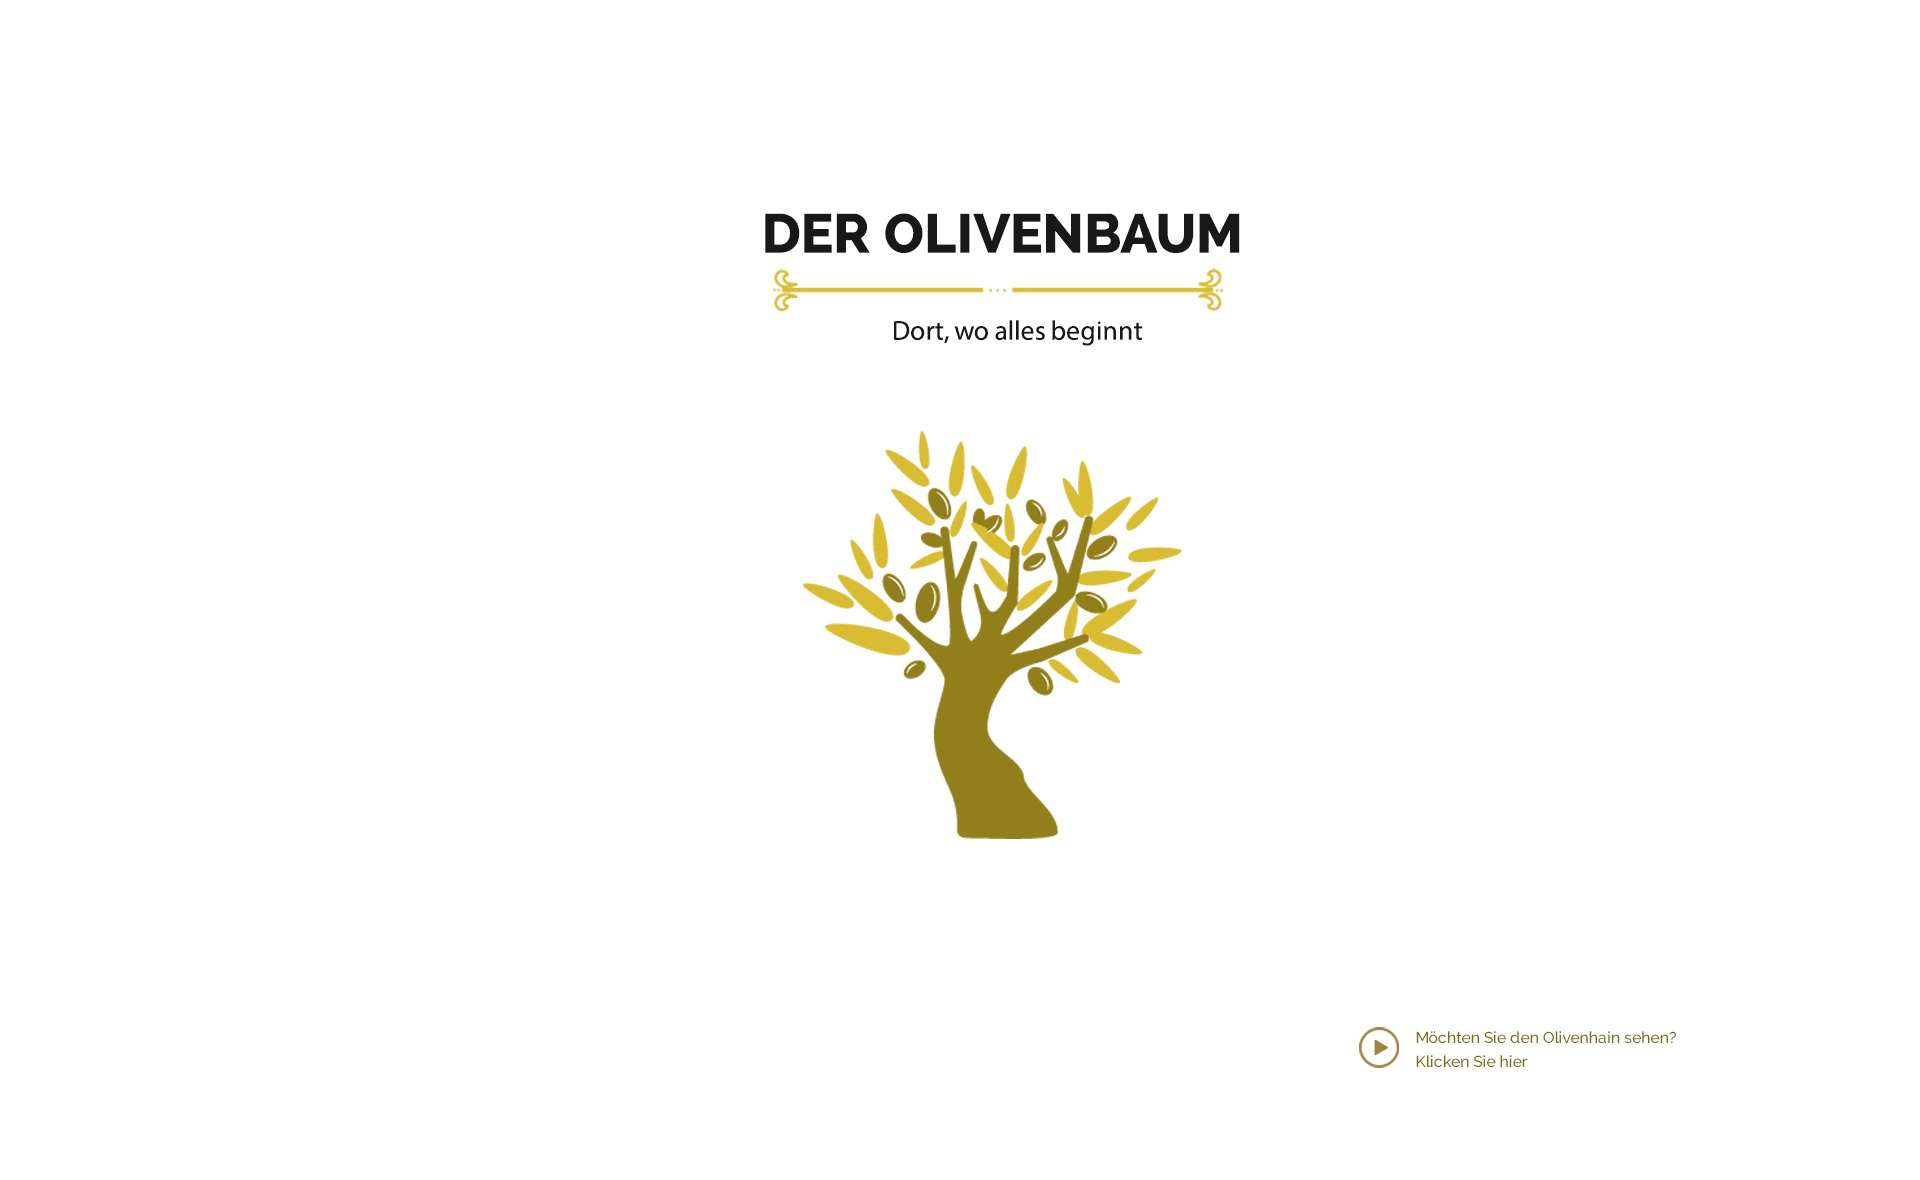 Olivenöl kommt aus dem Olivenbaum